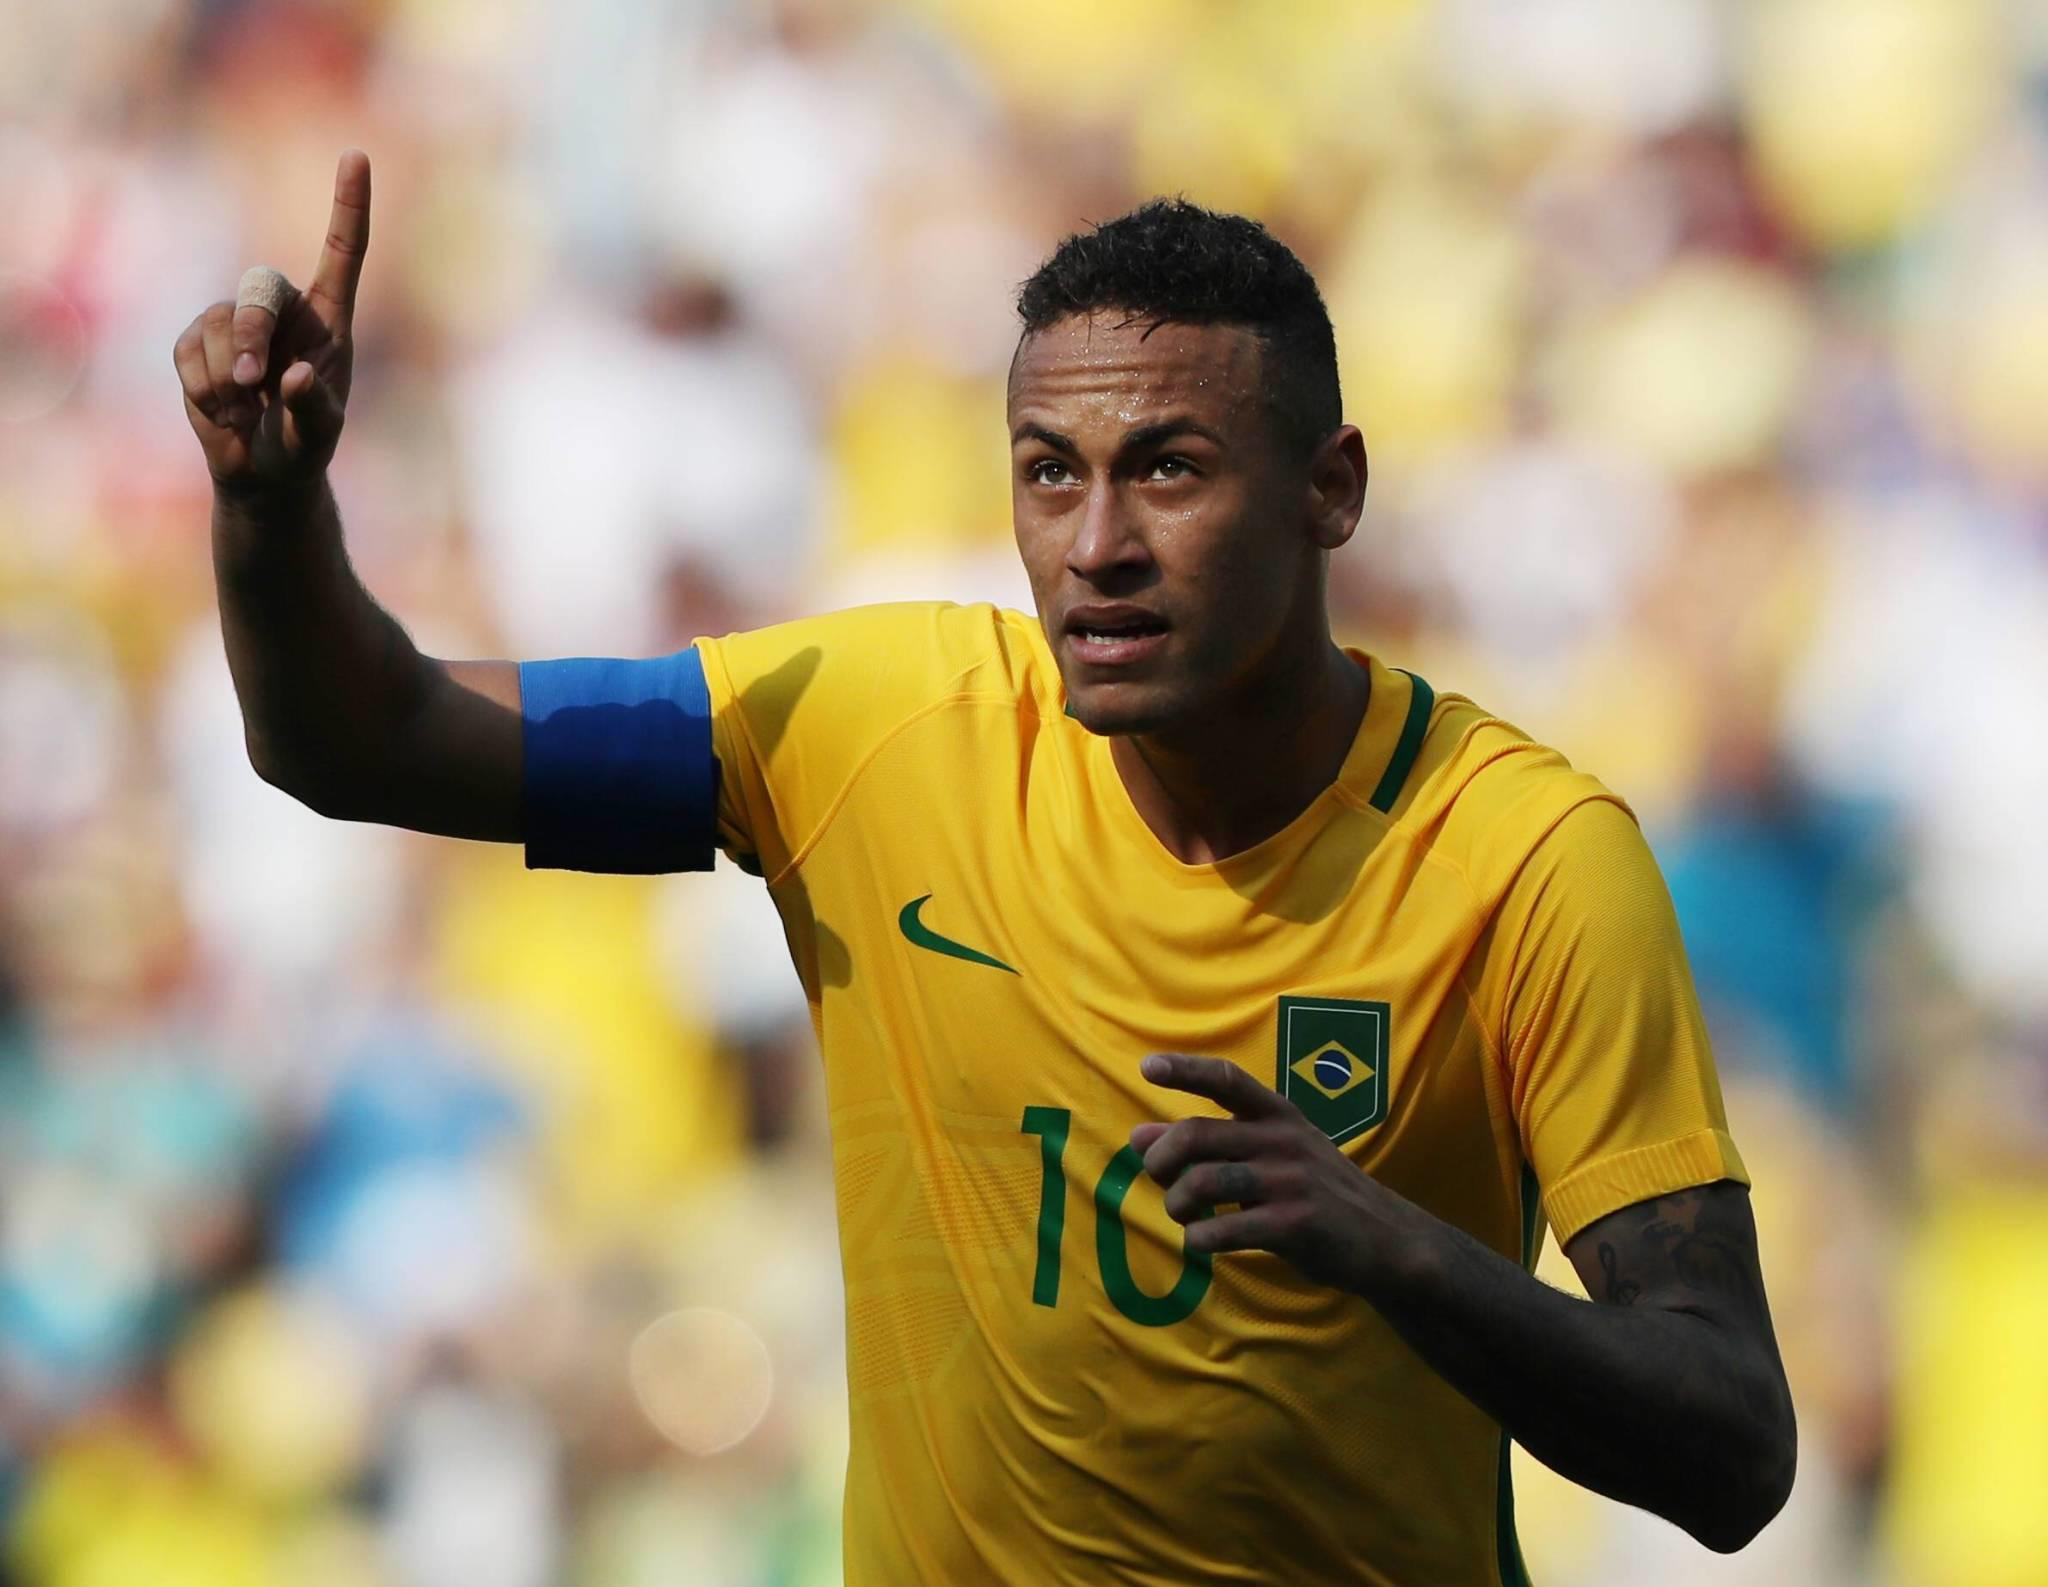 deutschland gegen brasilien olympia